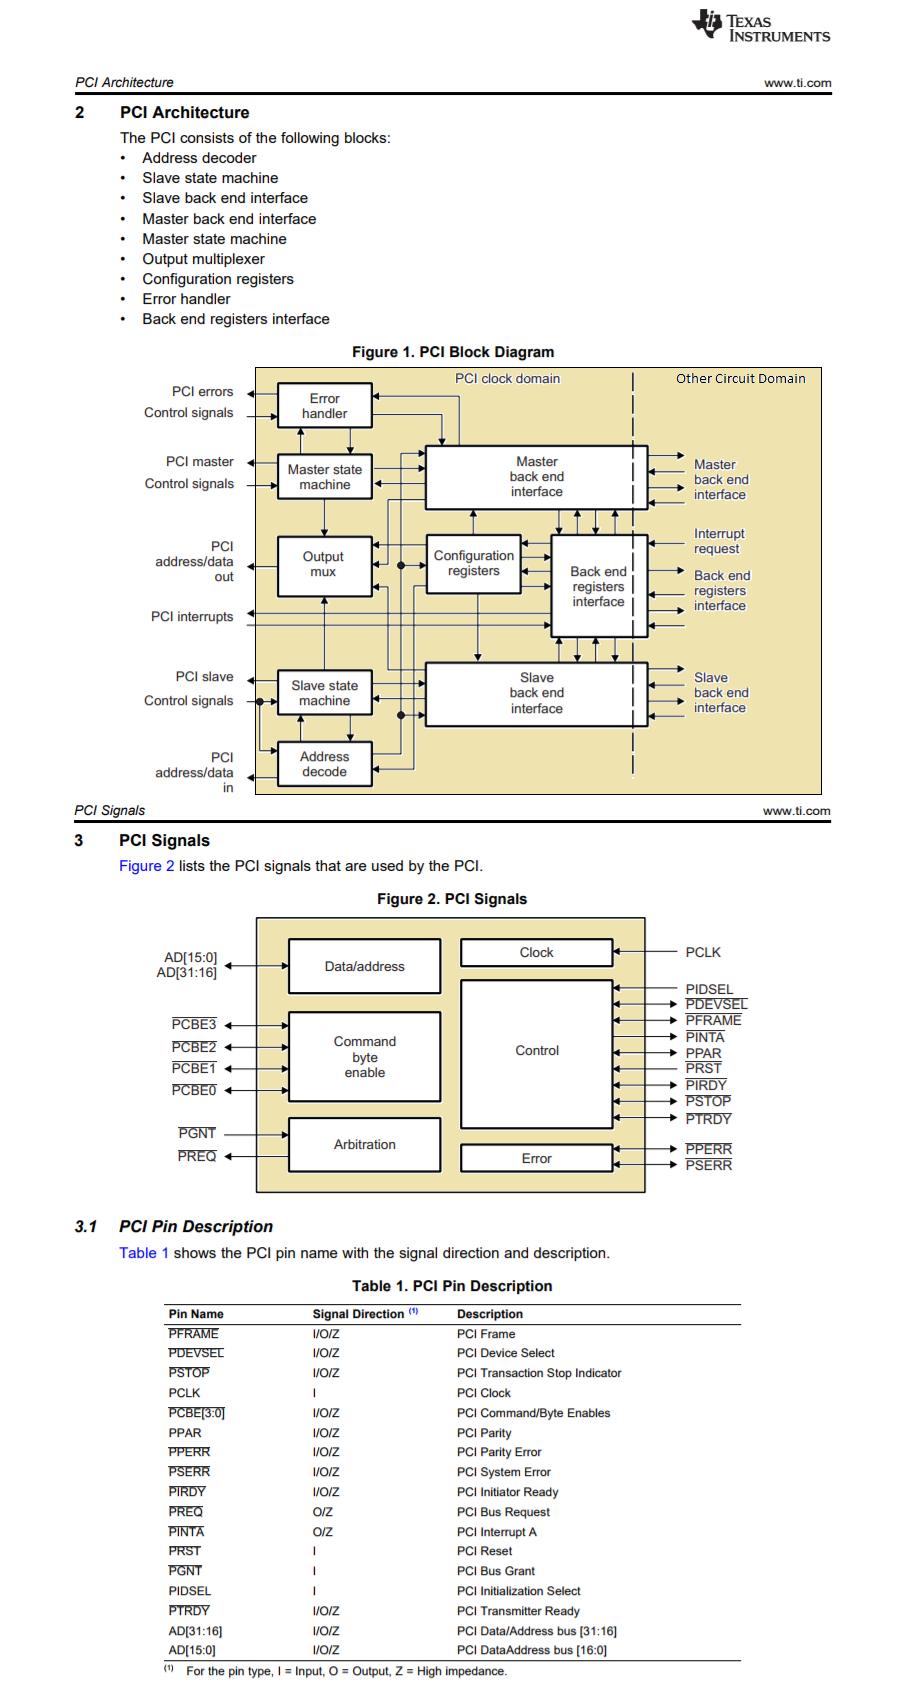 Diagrama de blocos do controlador PCI